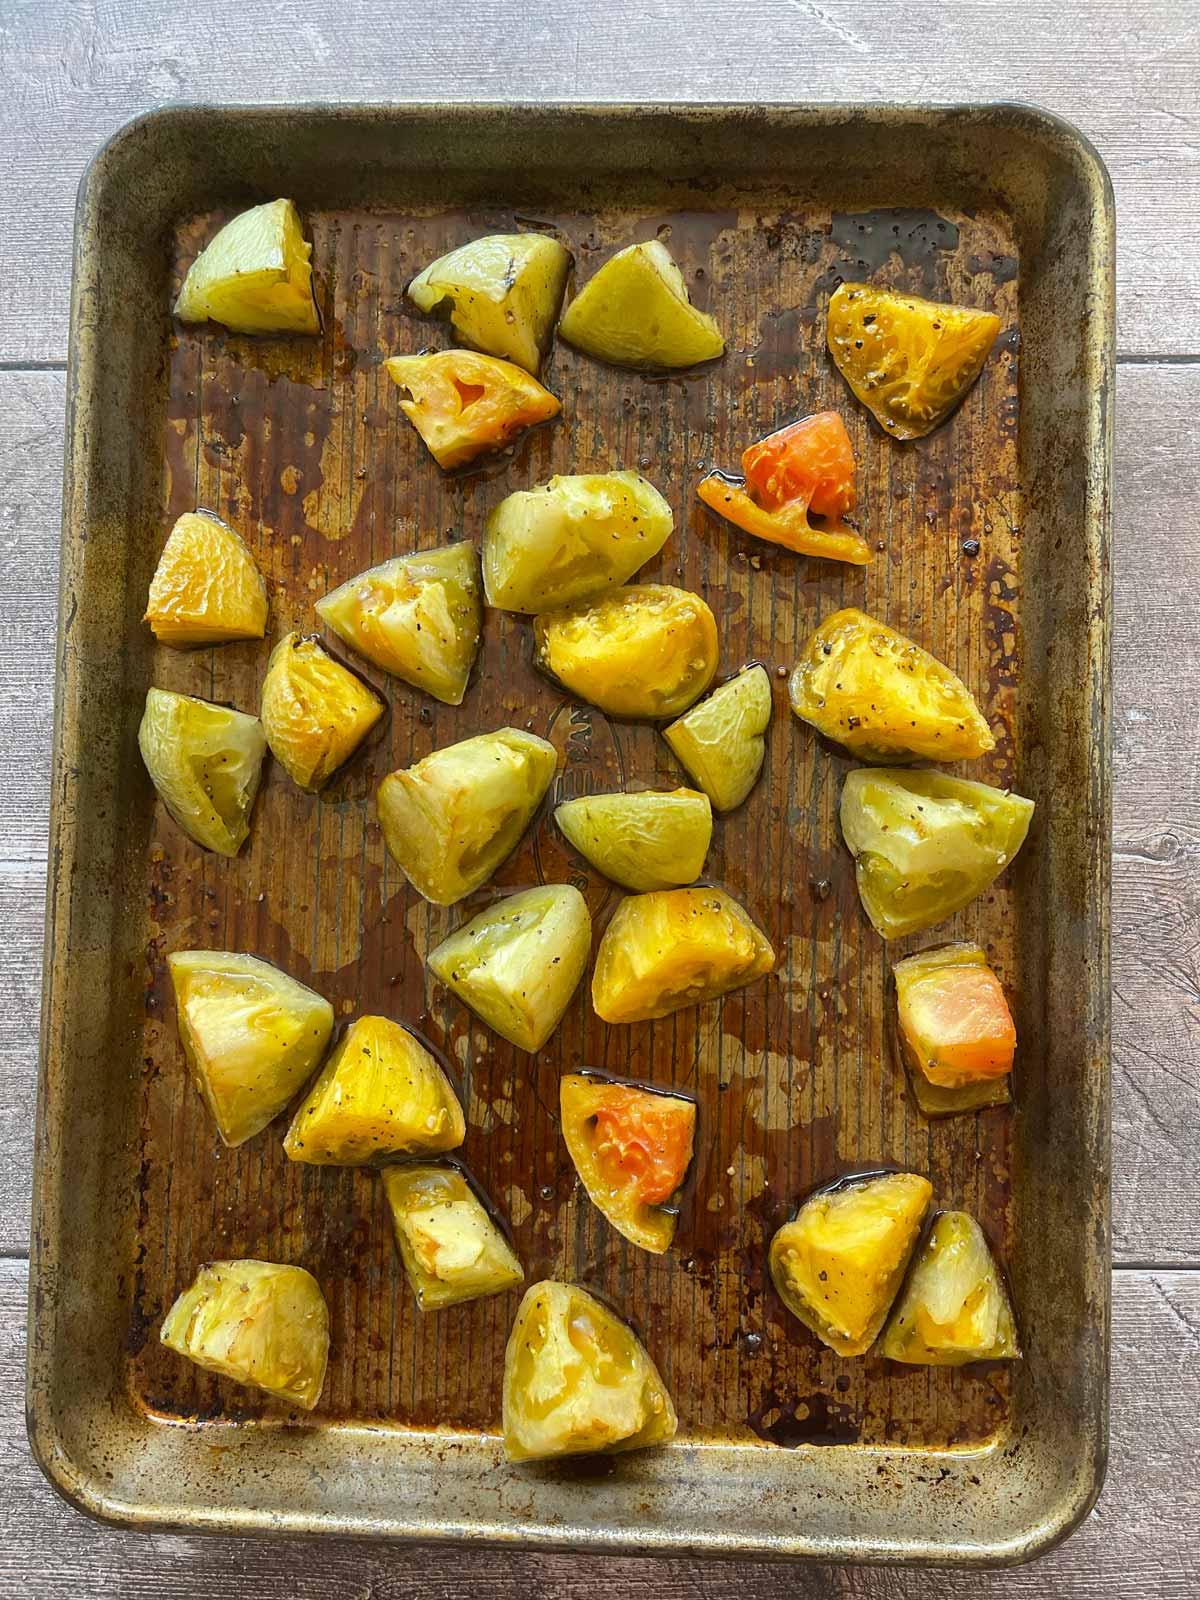 Roasted green tomatoes on baking sheet